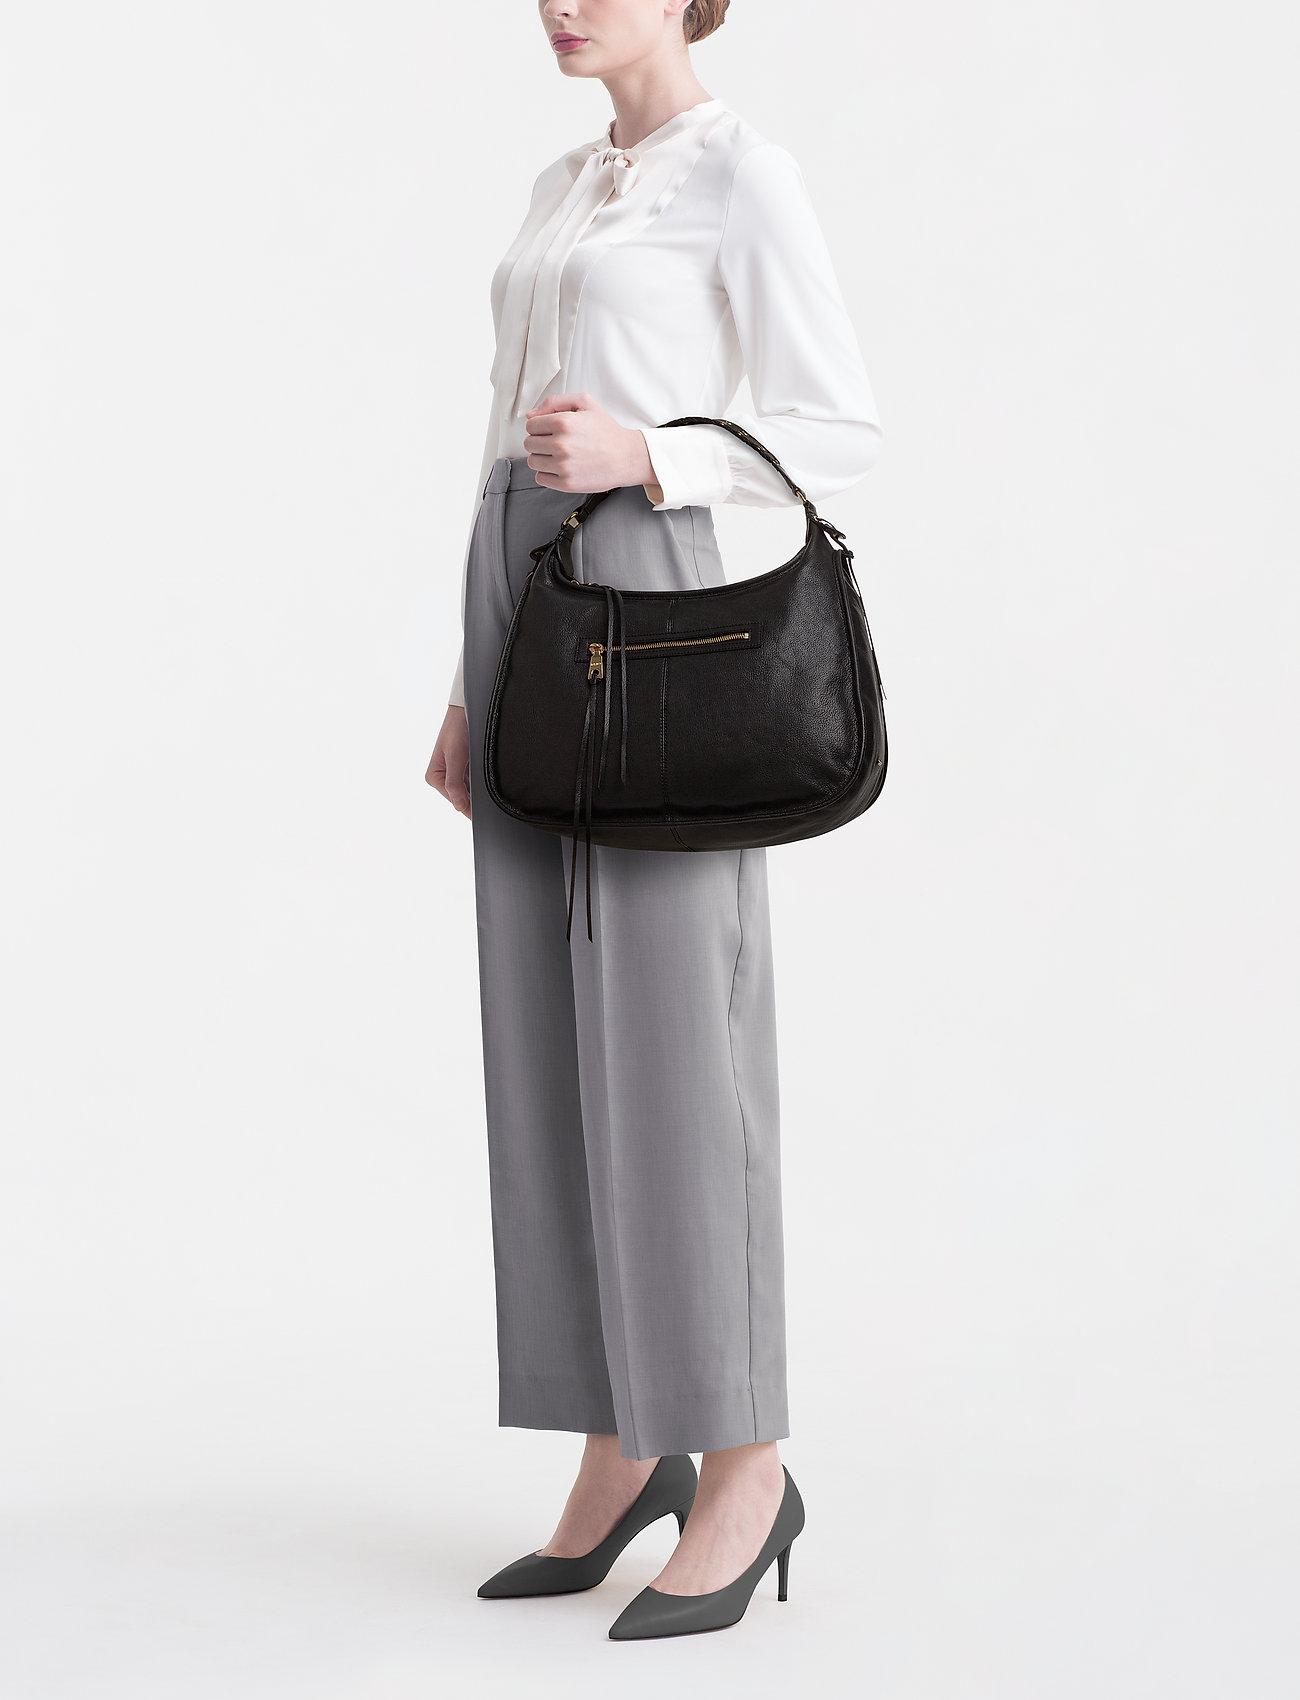 DKNY Bags SHANNA- HOBO - BLACK